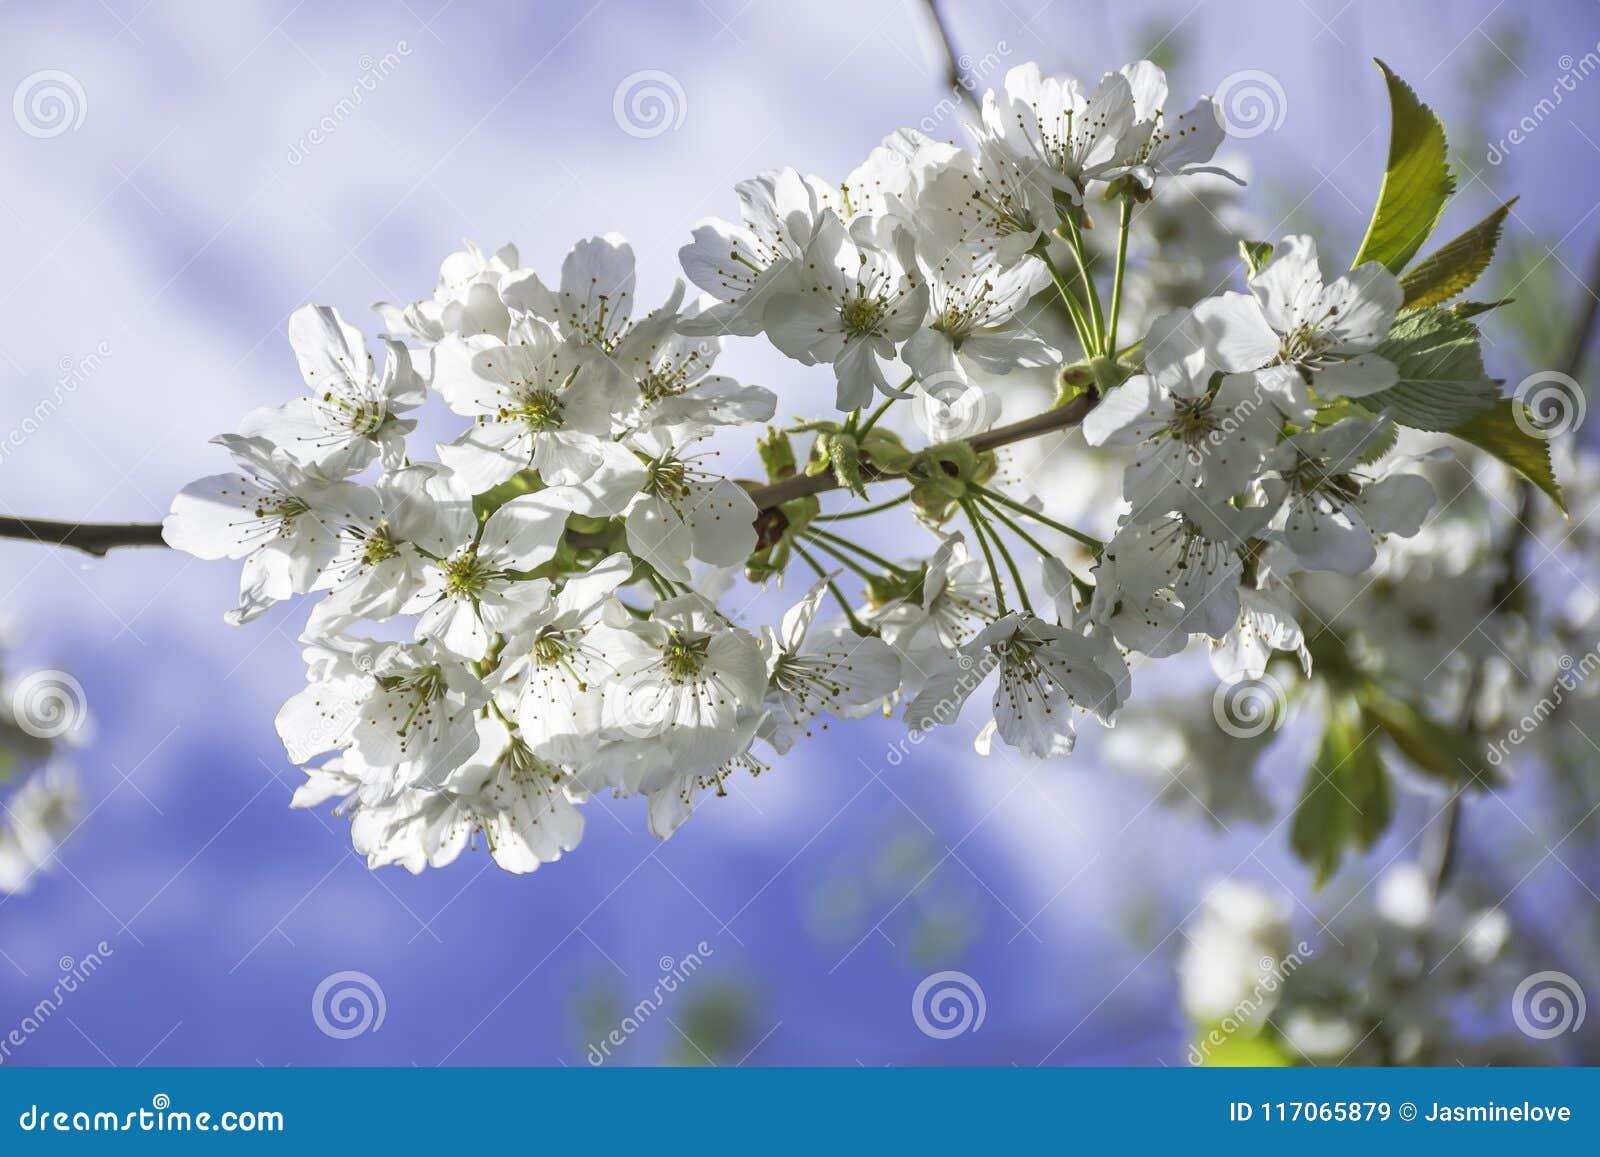 Springtime Blossom Stock Image Image Of Flowers Bloom 117065879